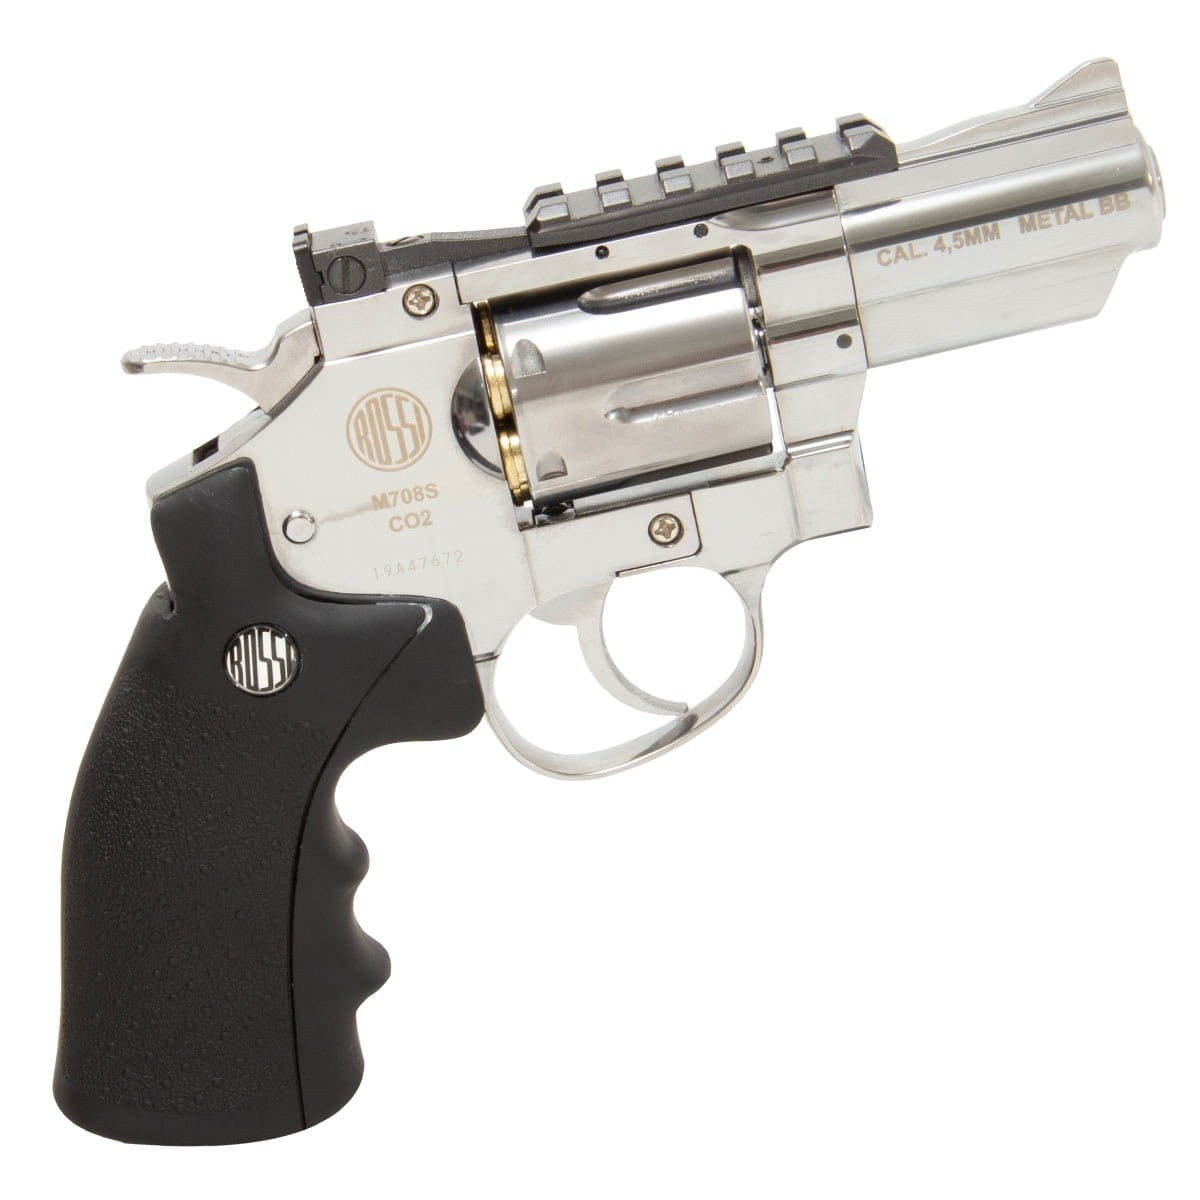 "Consórcio Revolver Rossi Pressão Co2 708S 2"" 4.5mm"